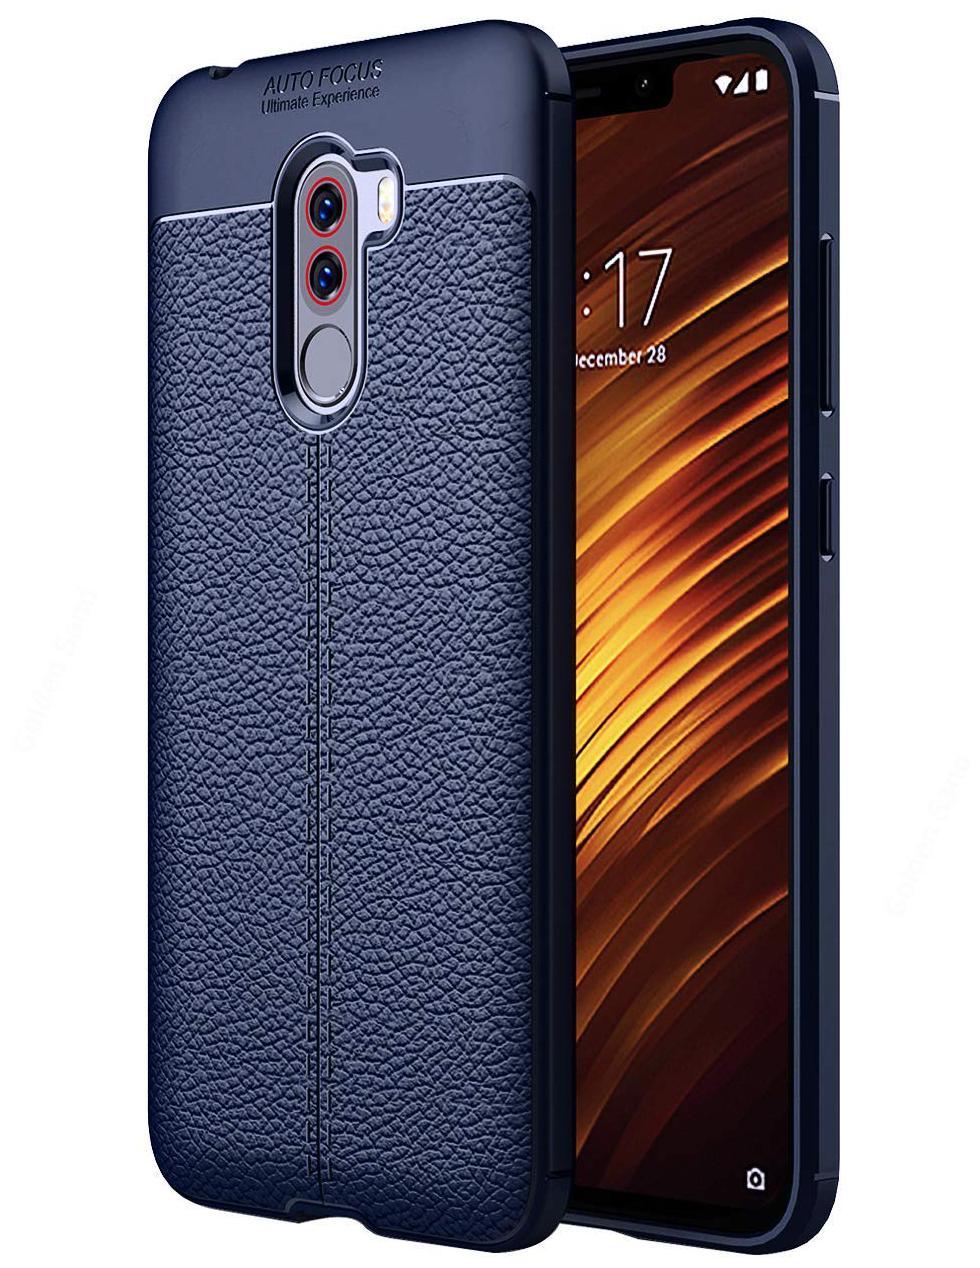 INCLU Premium Xiaomi Poco F1 Phone Back Cover Case Drop Tested Premium Leather TexturedShock Proof Armor -Blue